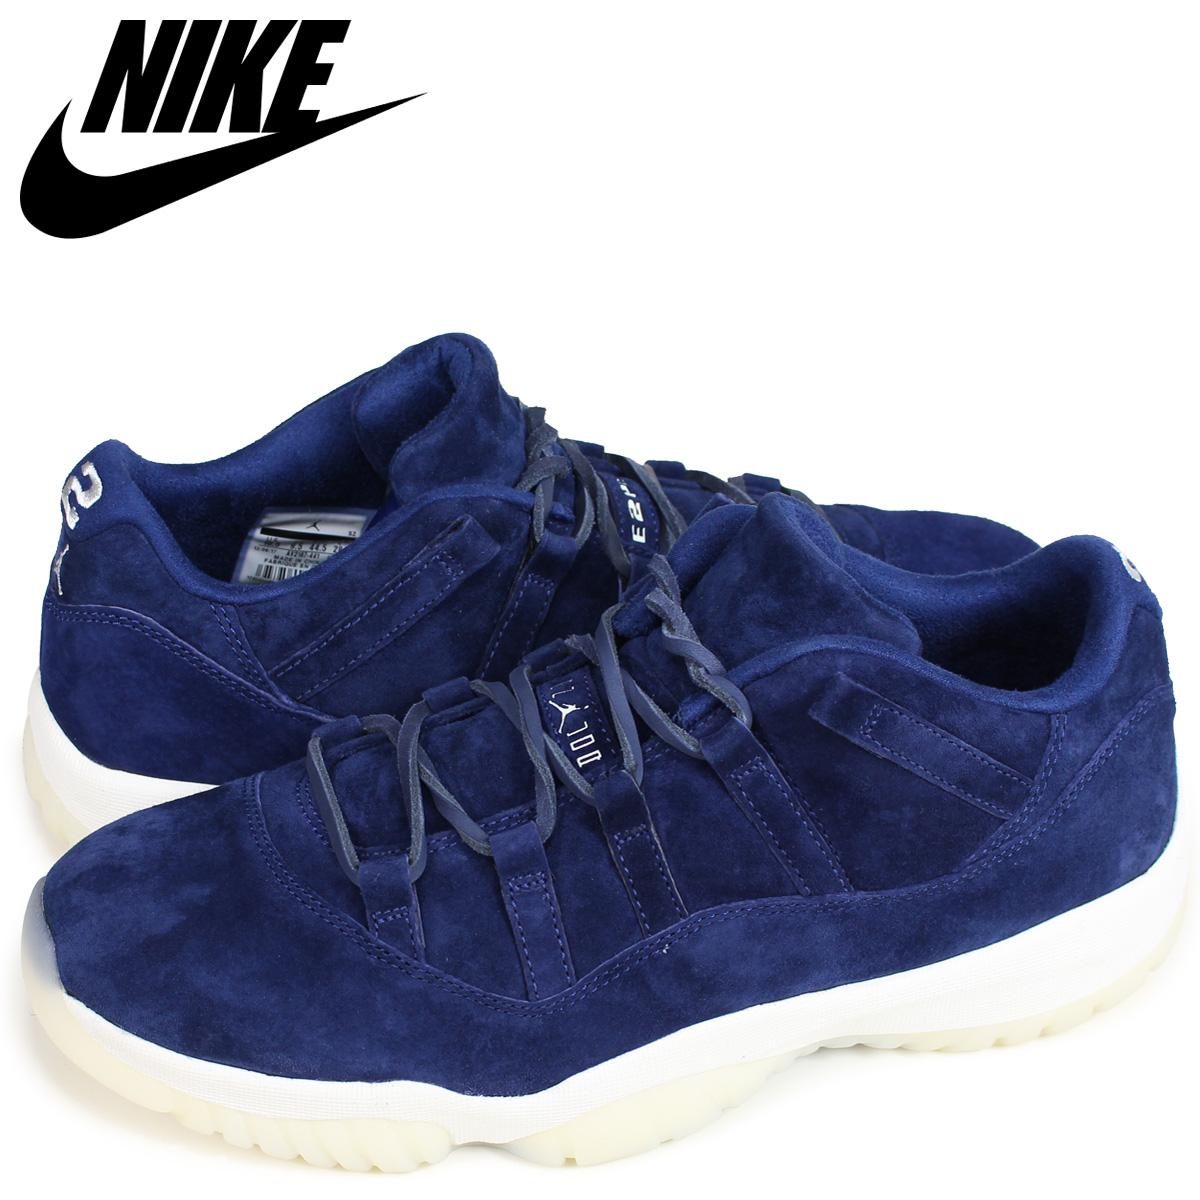 714e0360fffb NIKE AIR JORDAN 11 RETRO LOW RE2PECT Nike Air Jordan 11 nostalgic sneakers  men AV2187-441 blue